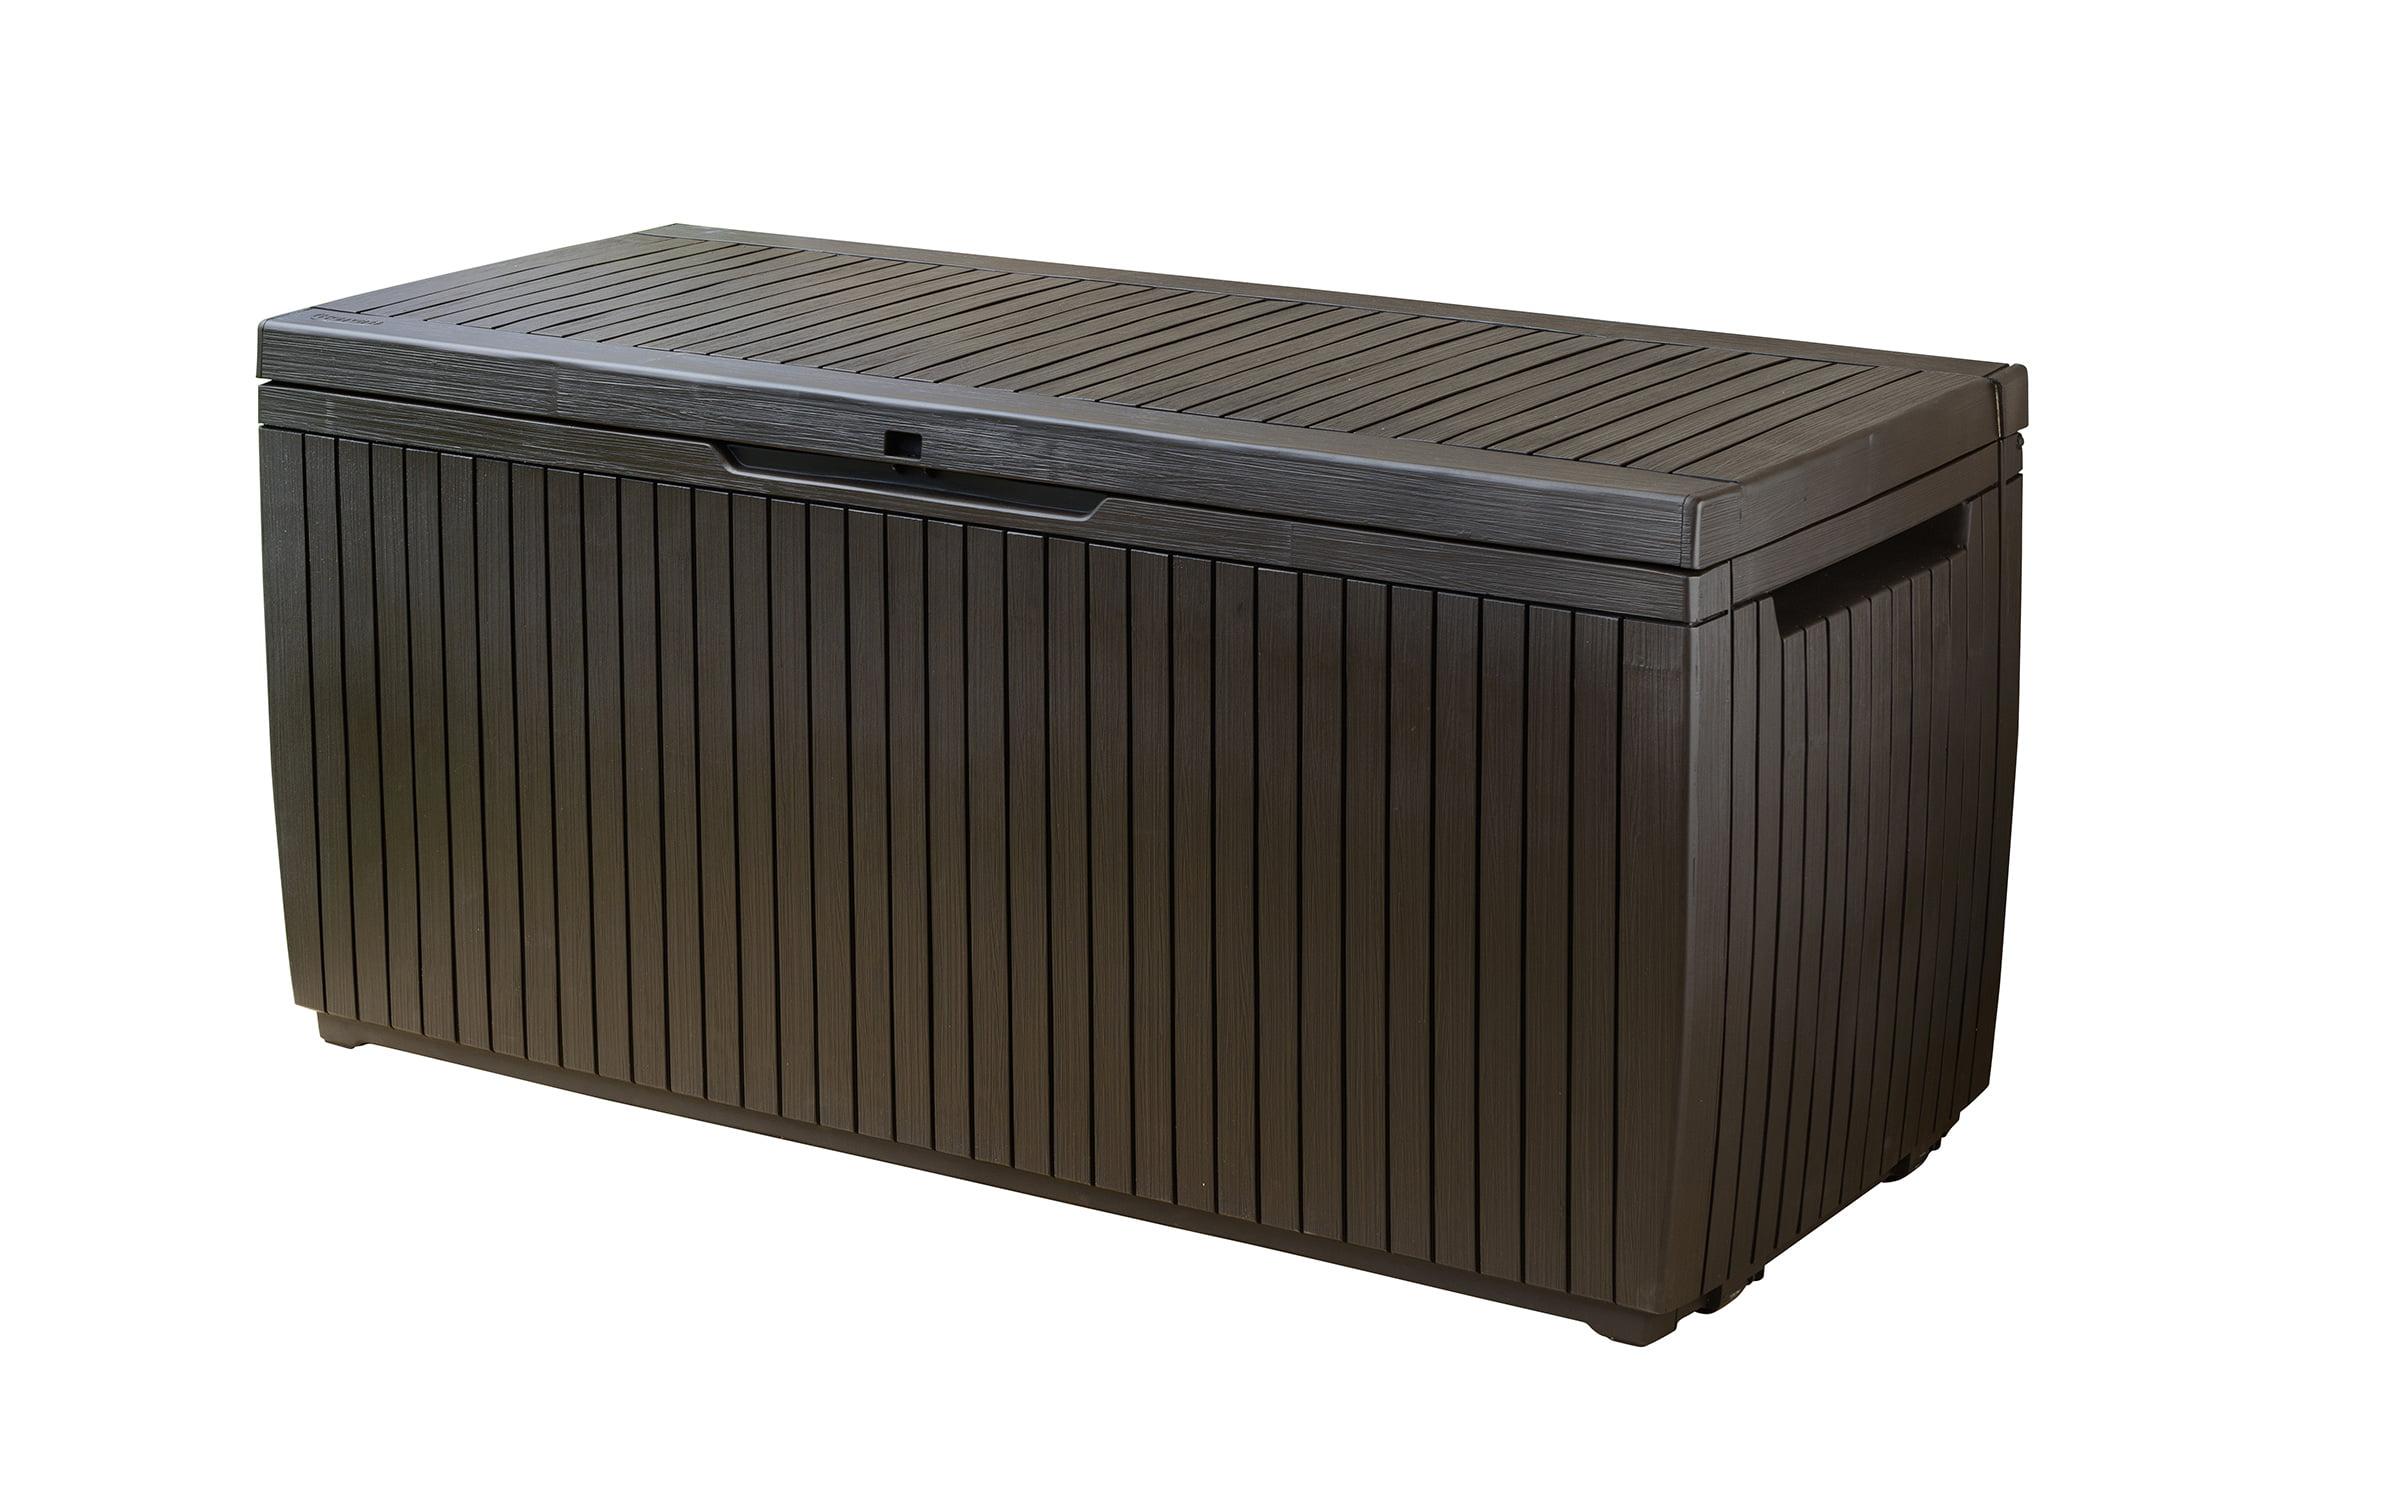 Keter Springwood 80 Gallon Plastic Deck Box, Resin Patio ...